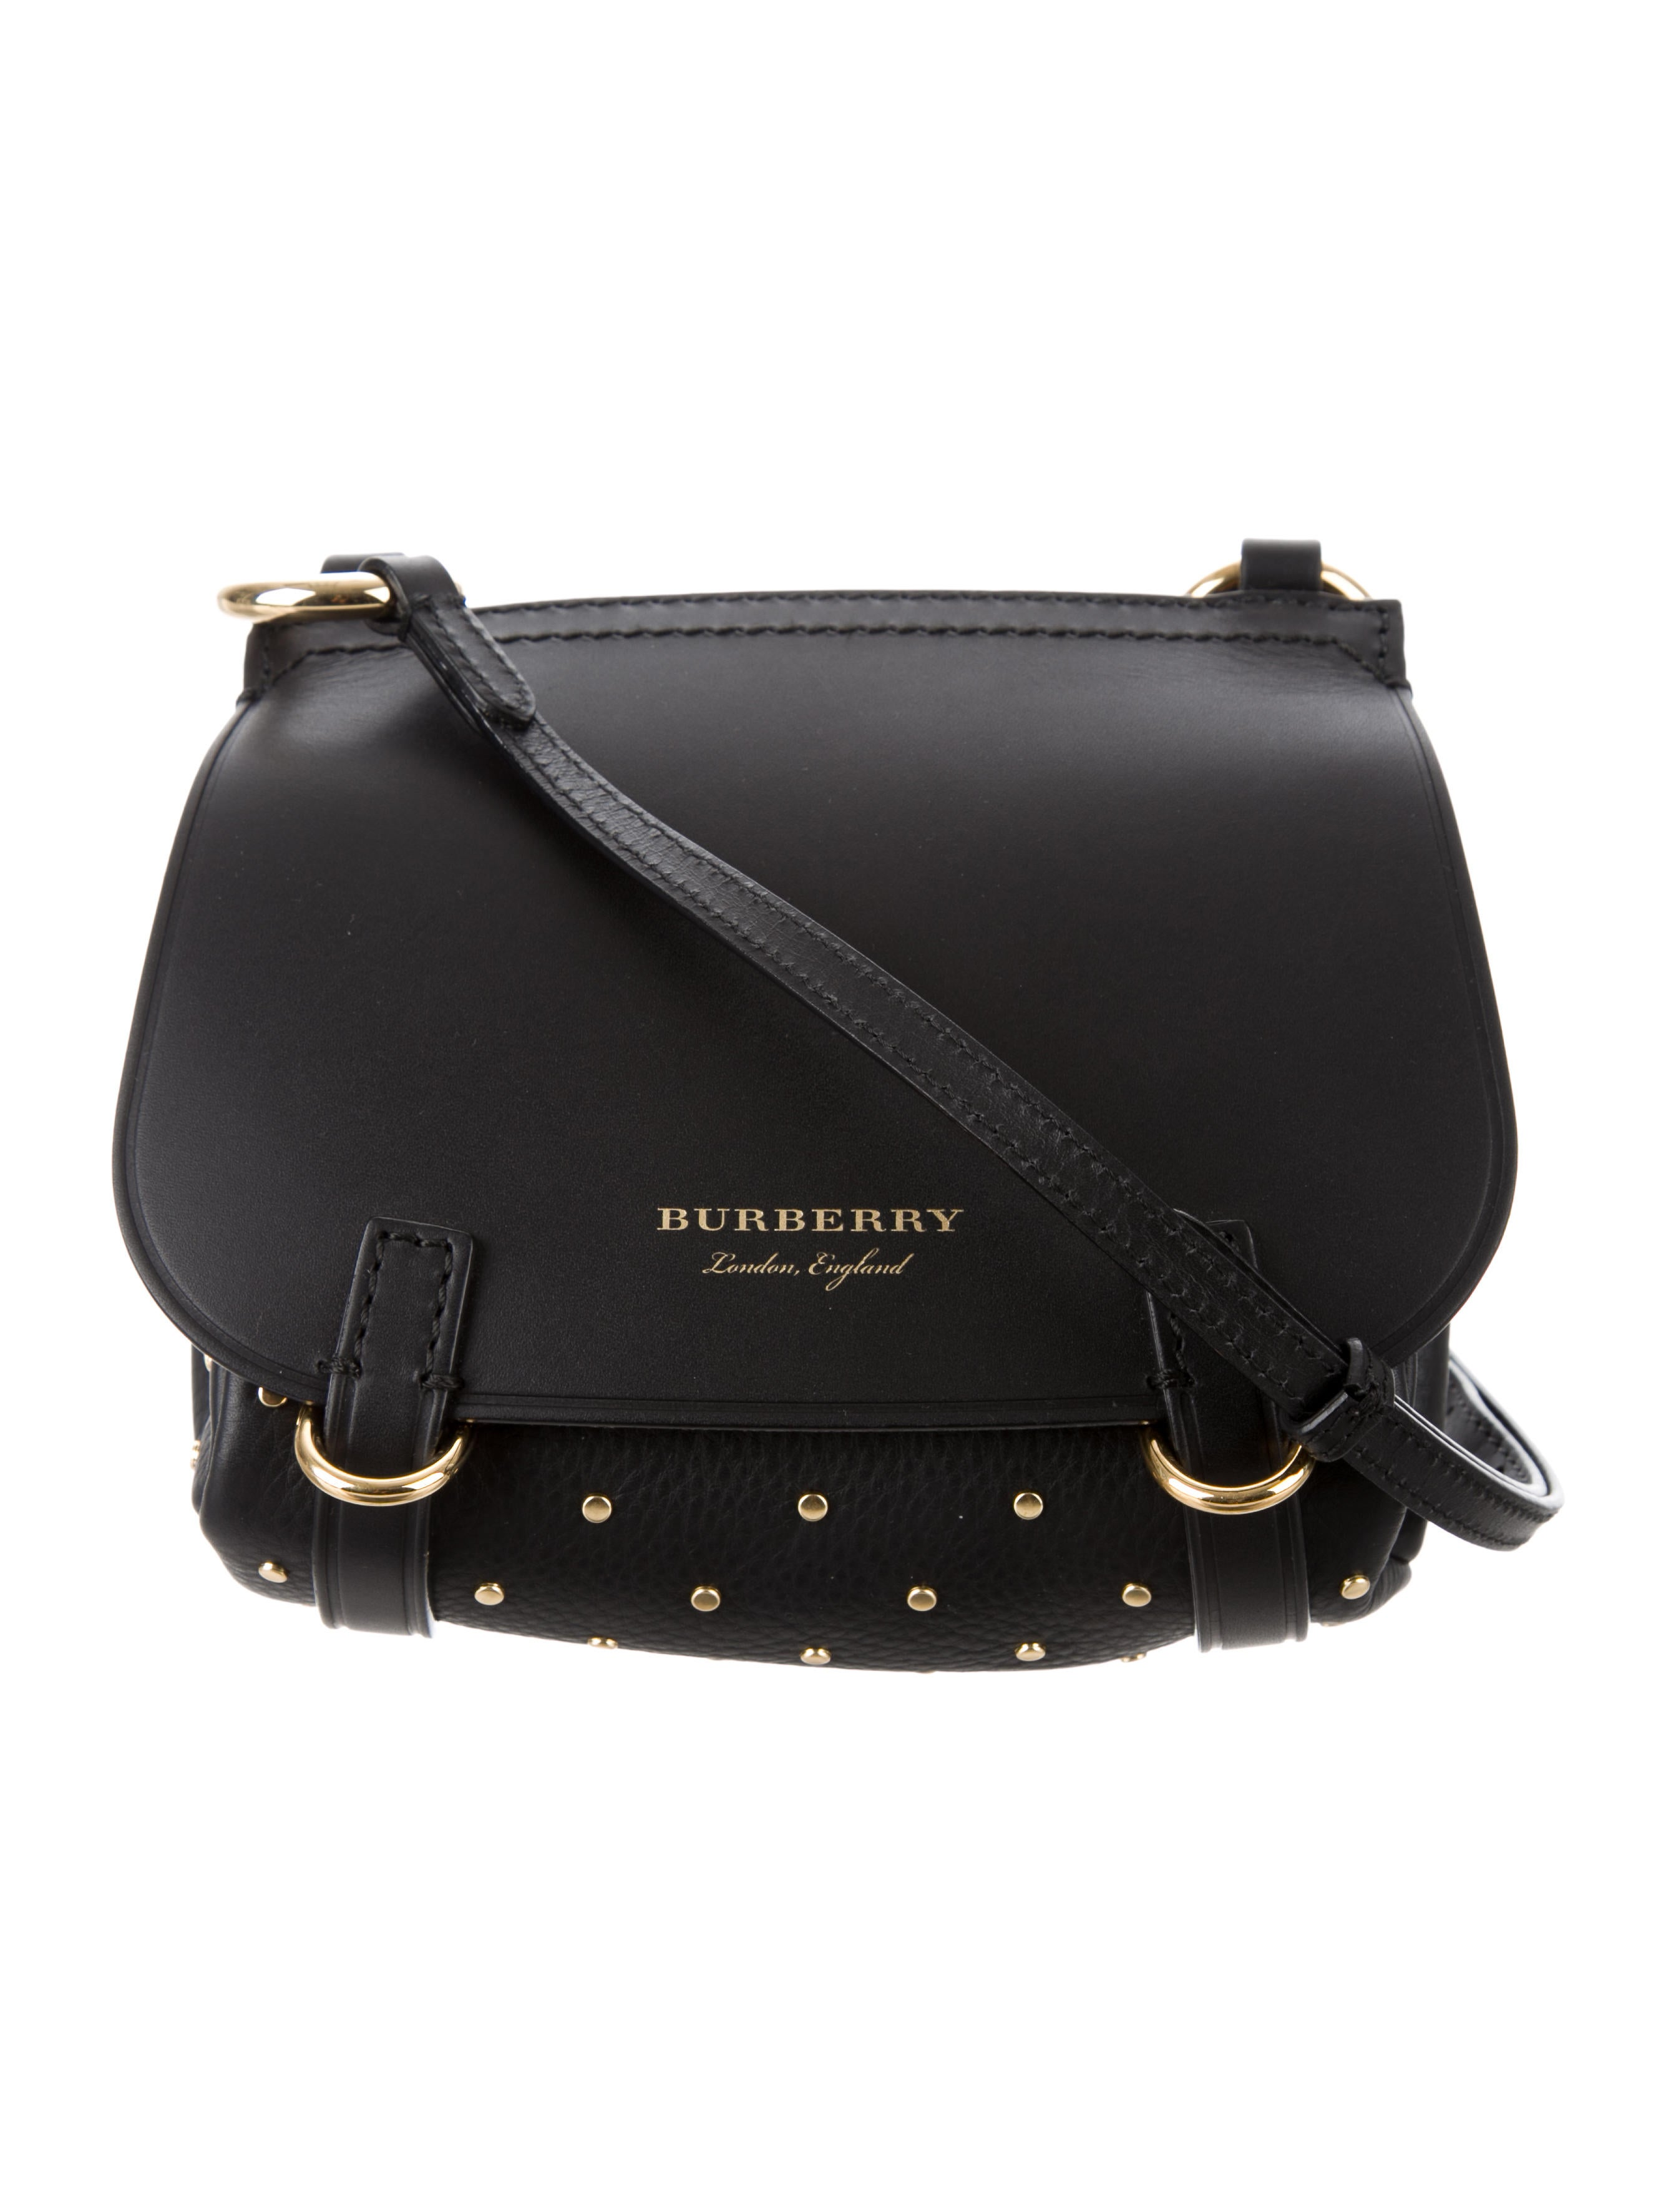 Burberry Riveted Baby Bridle Crossbody Bag - Handbags - BUR89137 ... bb1ff01e97502